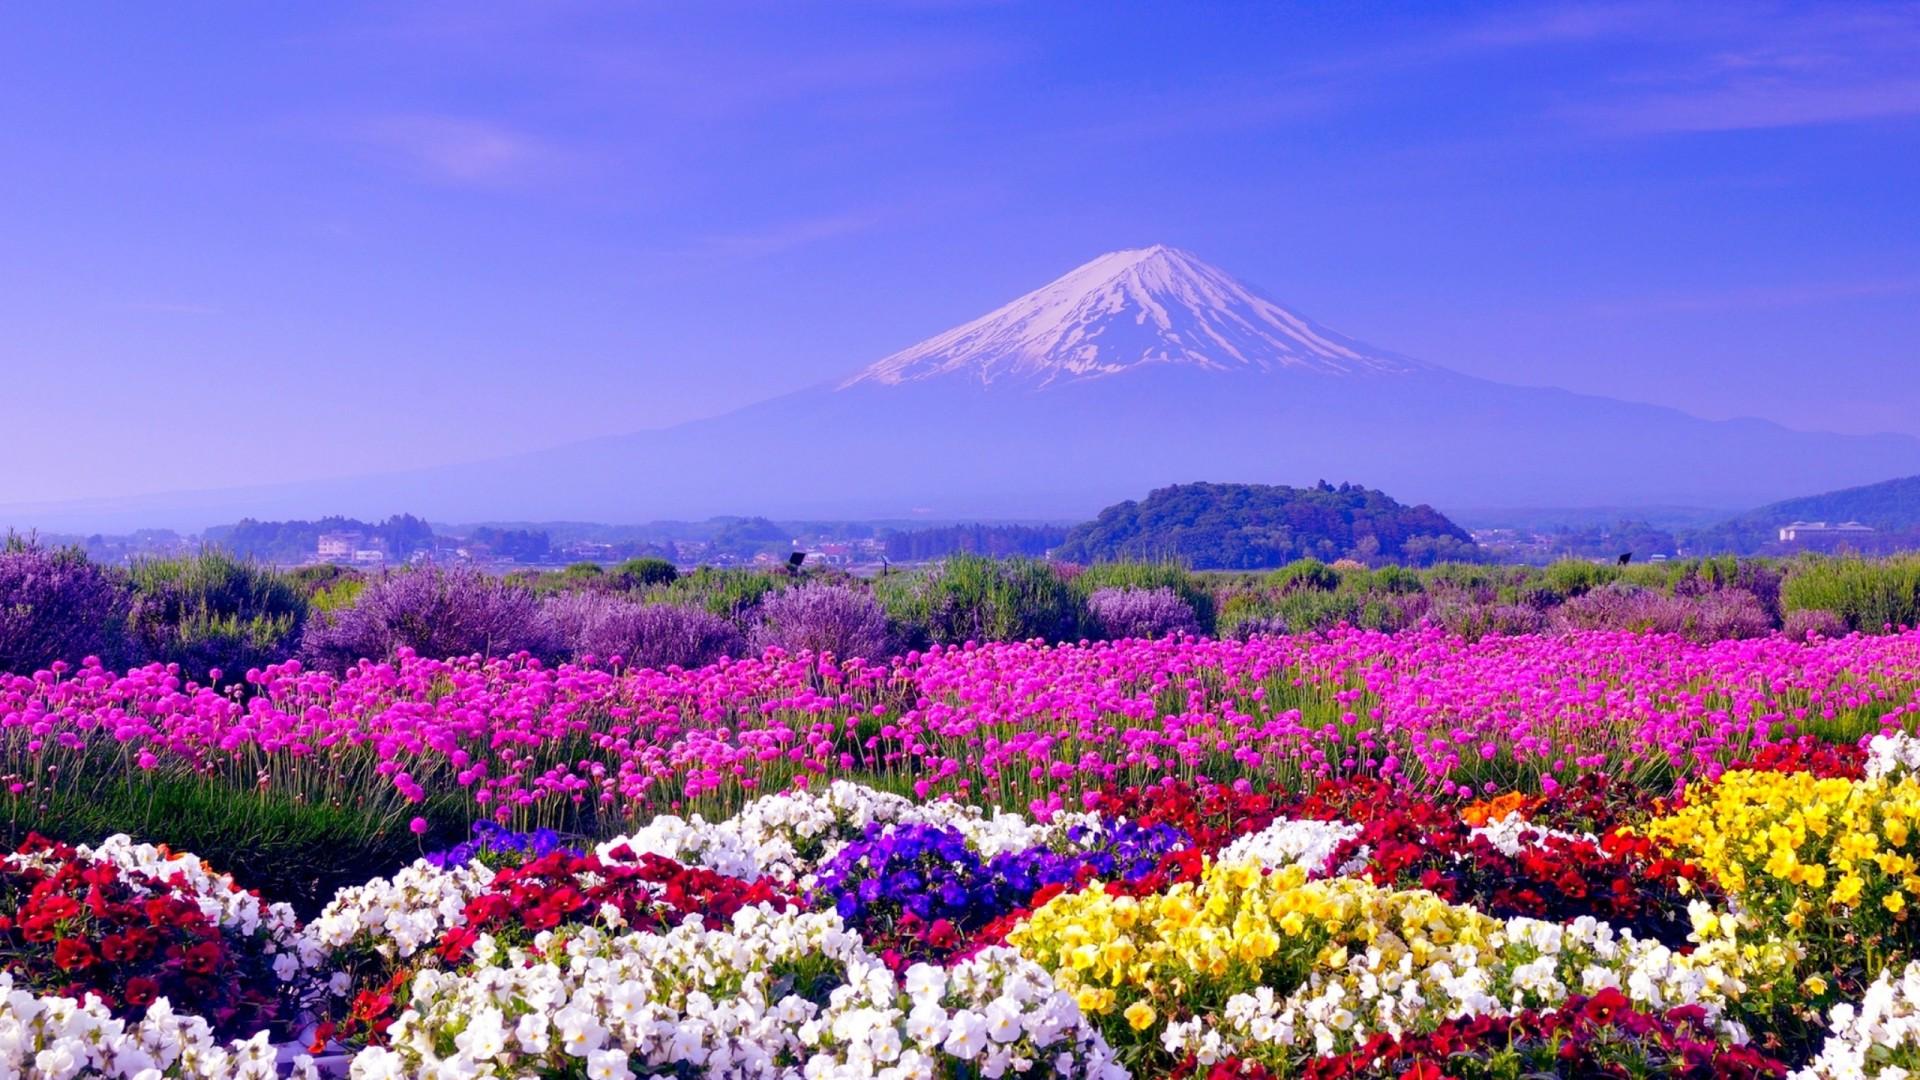 Spring in Japan Wallpapers HD download 1920x1080